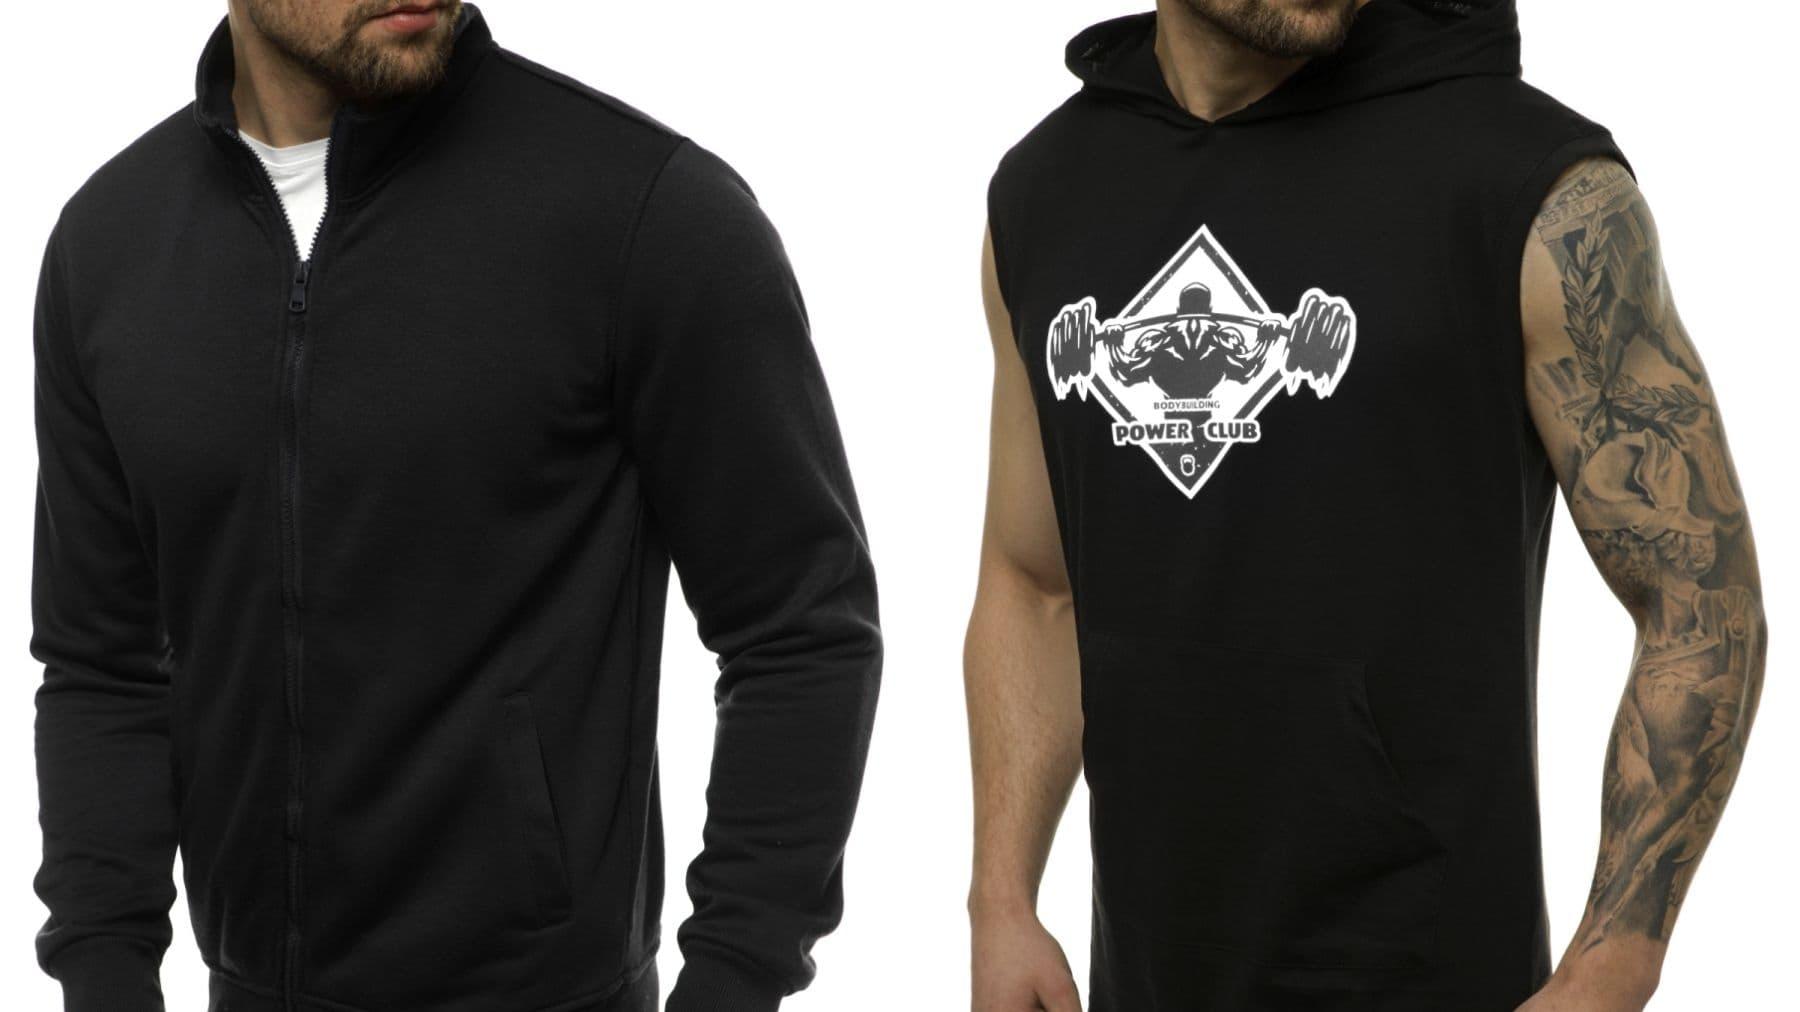 Bluza i T-shirt